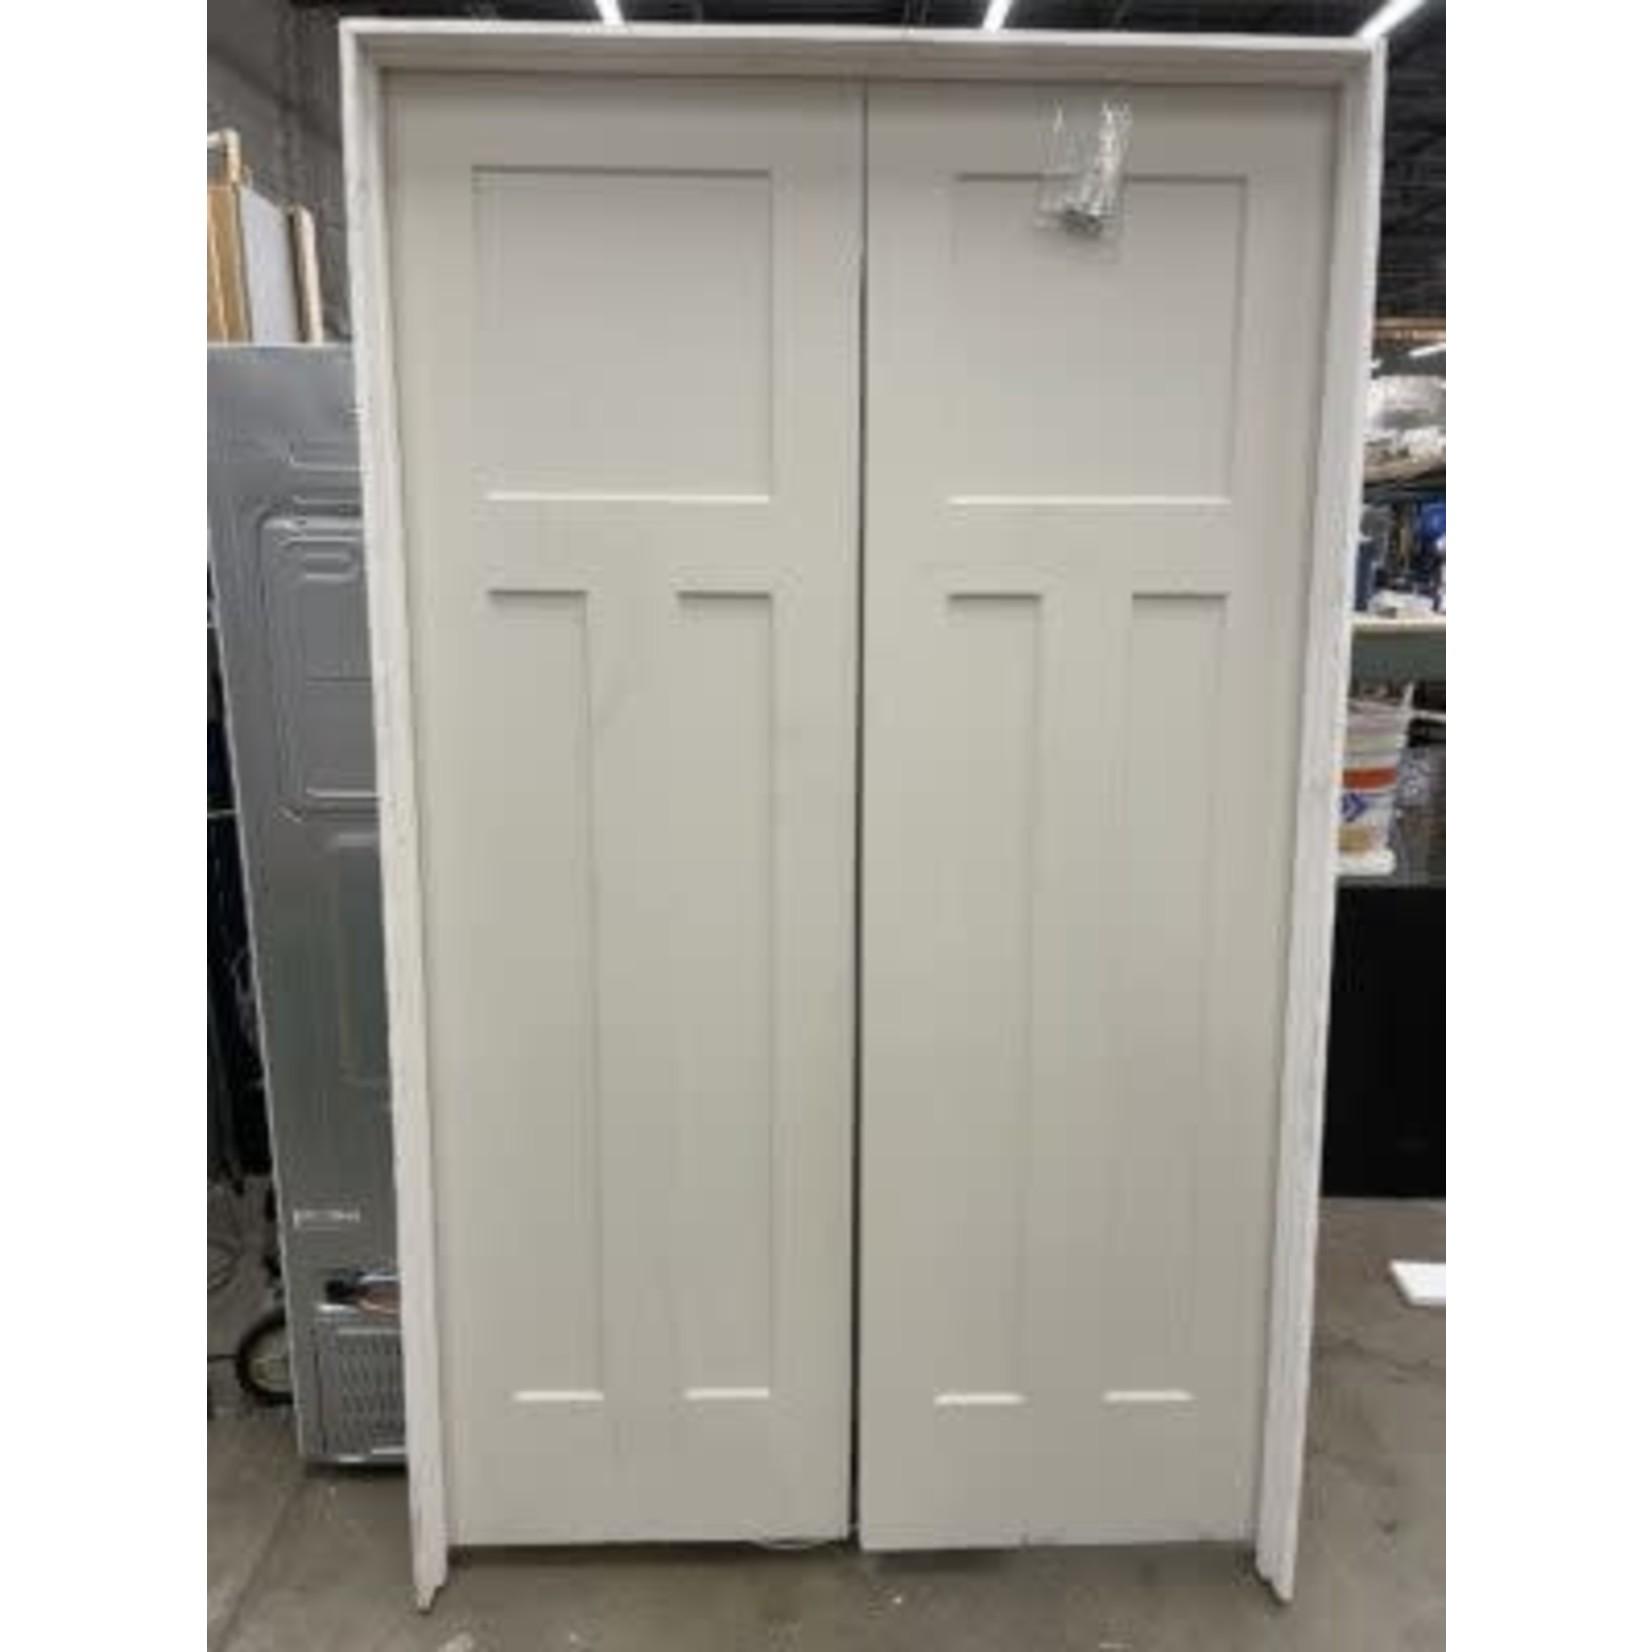 4070 Interior 3-Panel French Doors